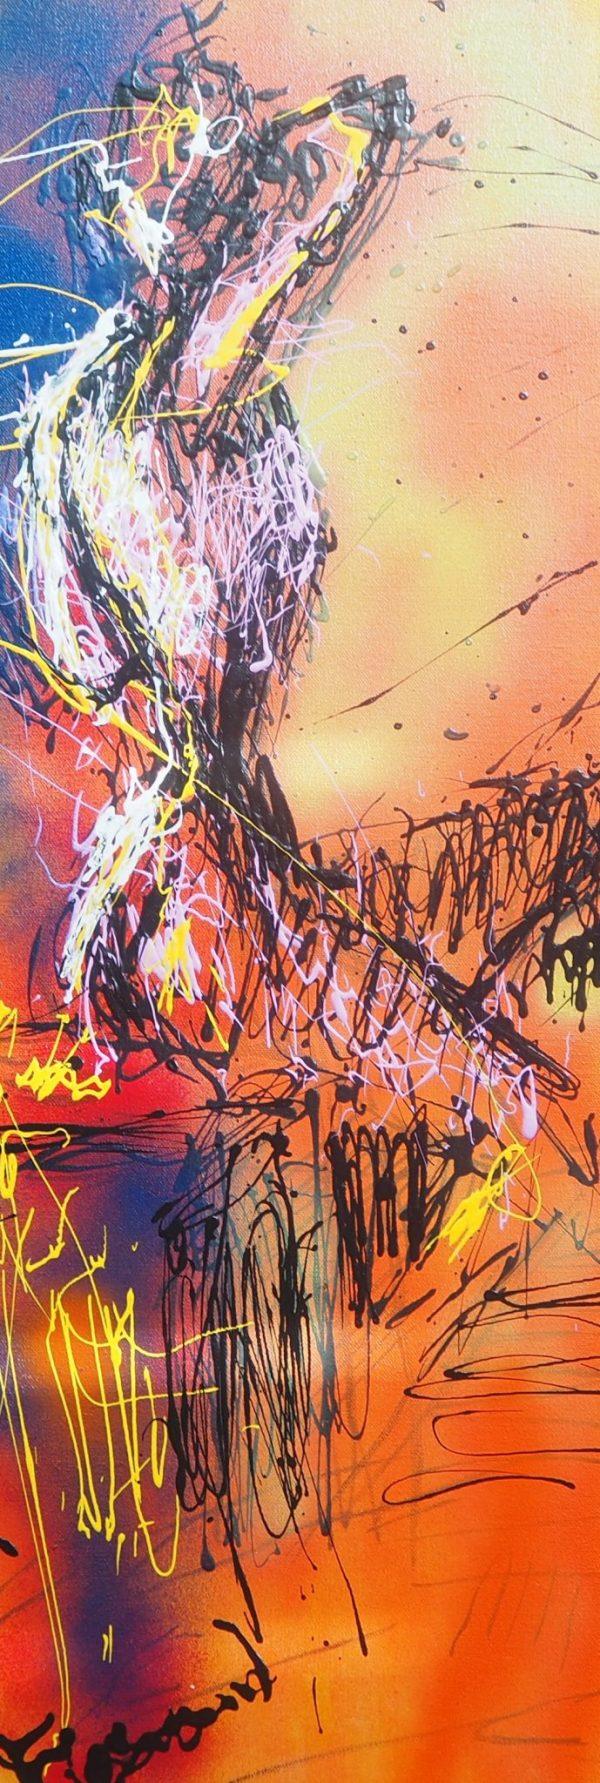 Gala Sketch Reimagined - farrand fine art